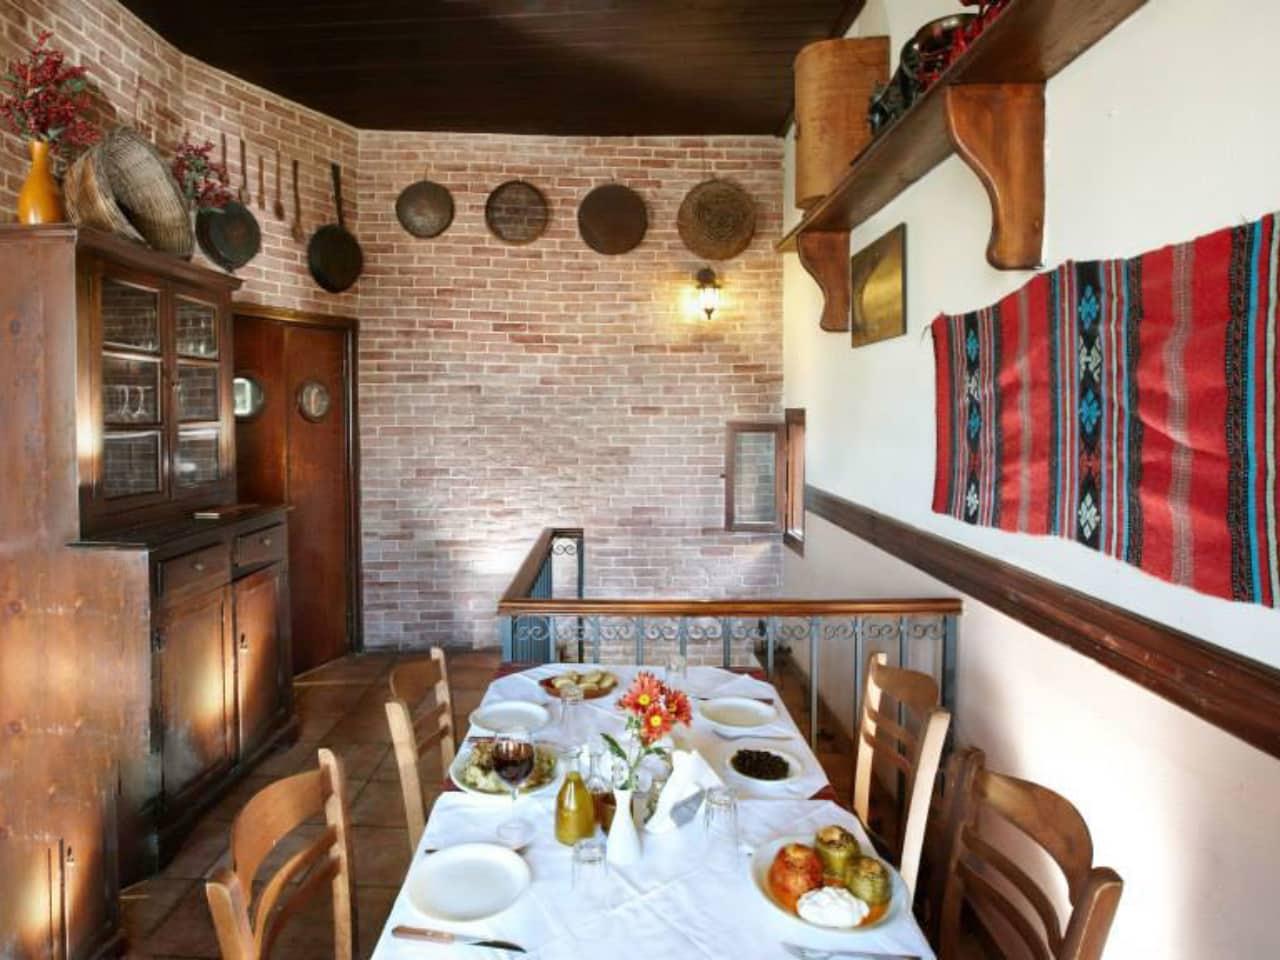 chrisostomos restaurant chania, hrisostomos tavern chania crete, chrisostomos chania crete, best cretan food chania, authentic food chania, gastronomy chania, where to eat chania